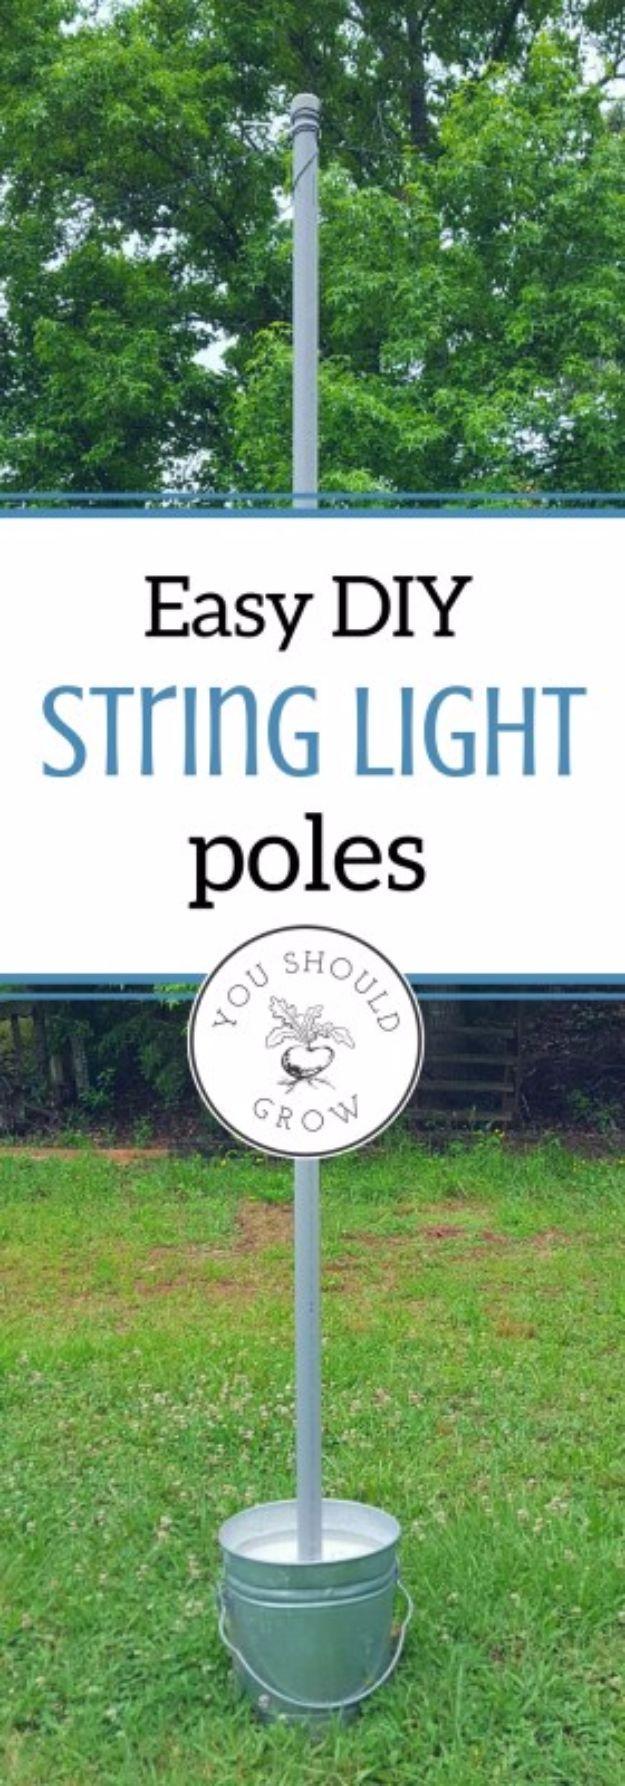 41 DIY Outdoor Lighting Ideas on Backyard String Lights Diy  id=56483